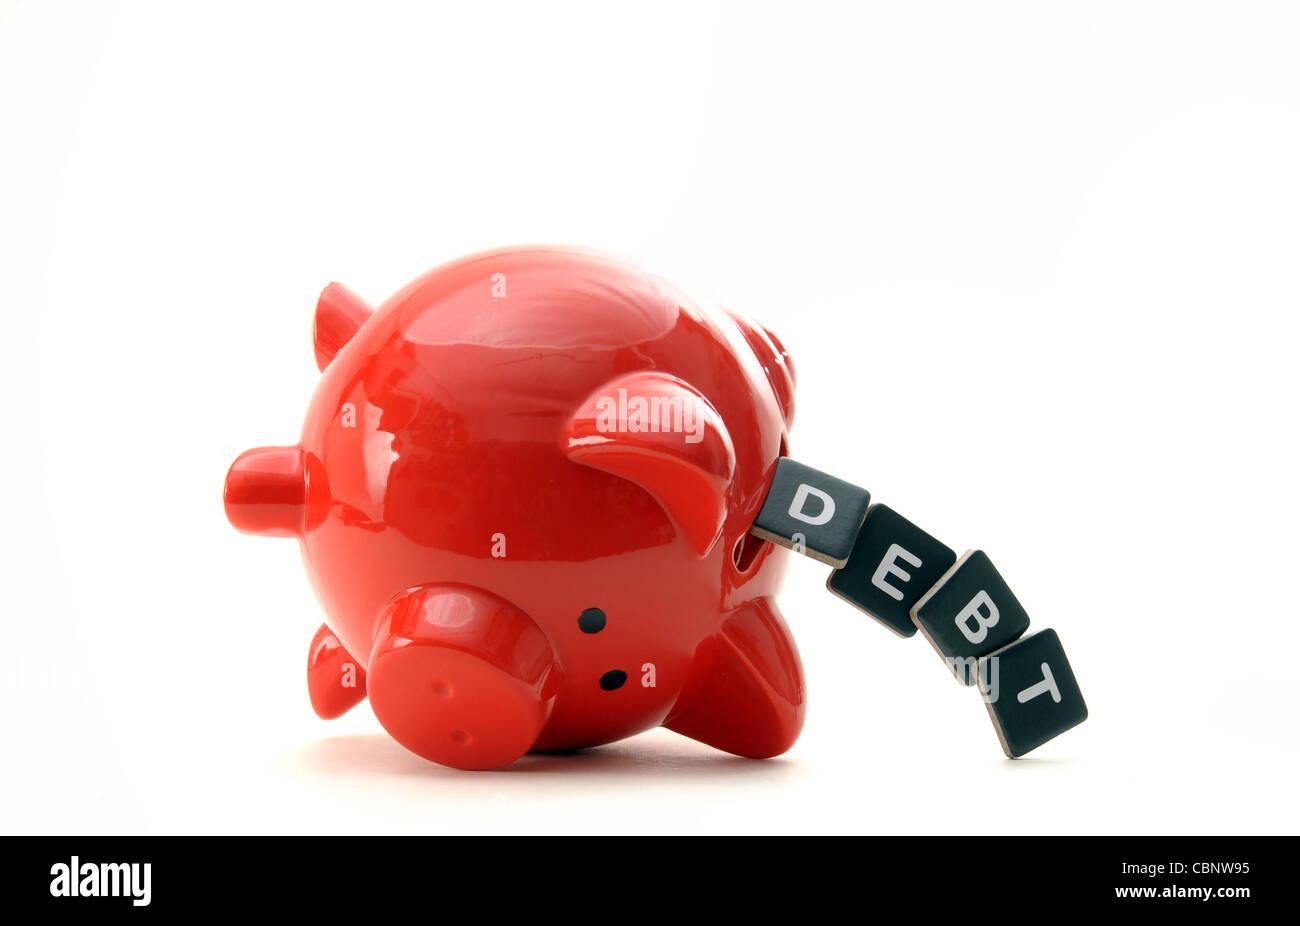 Fast cash loans for bad credit australia image 10